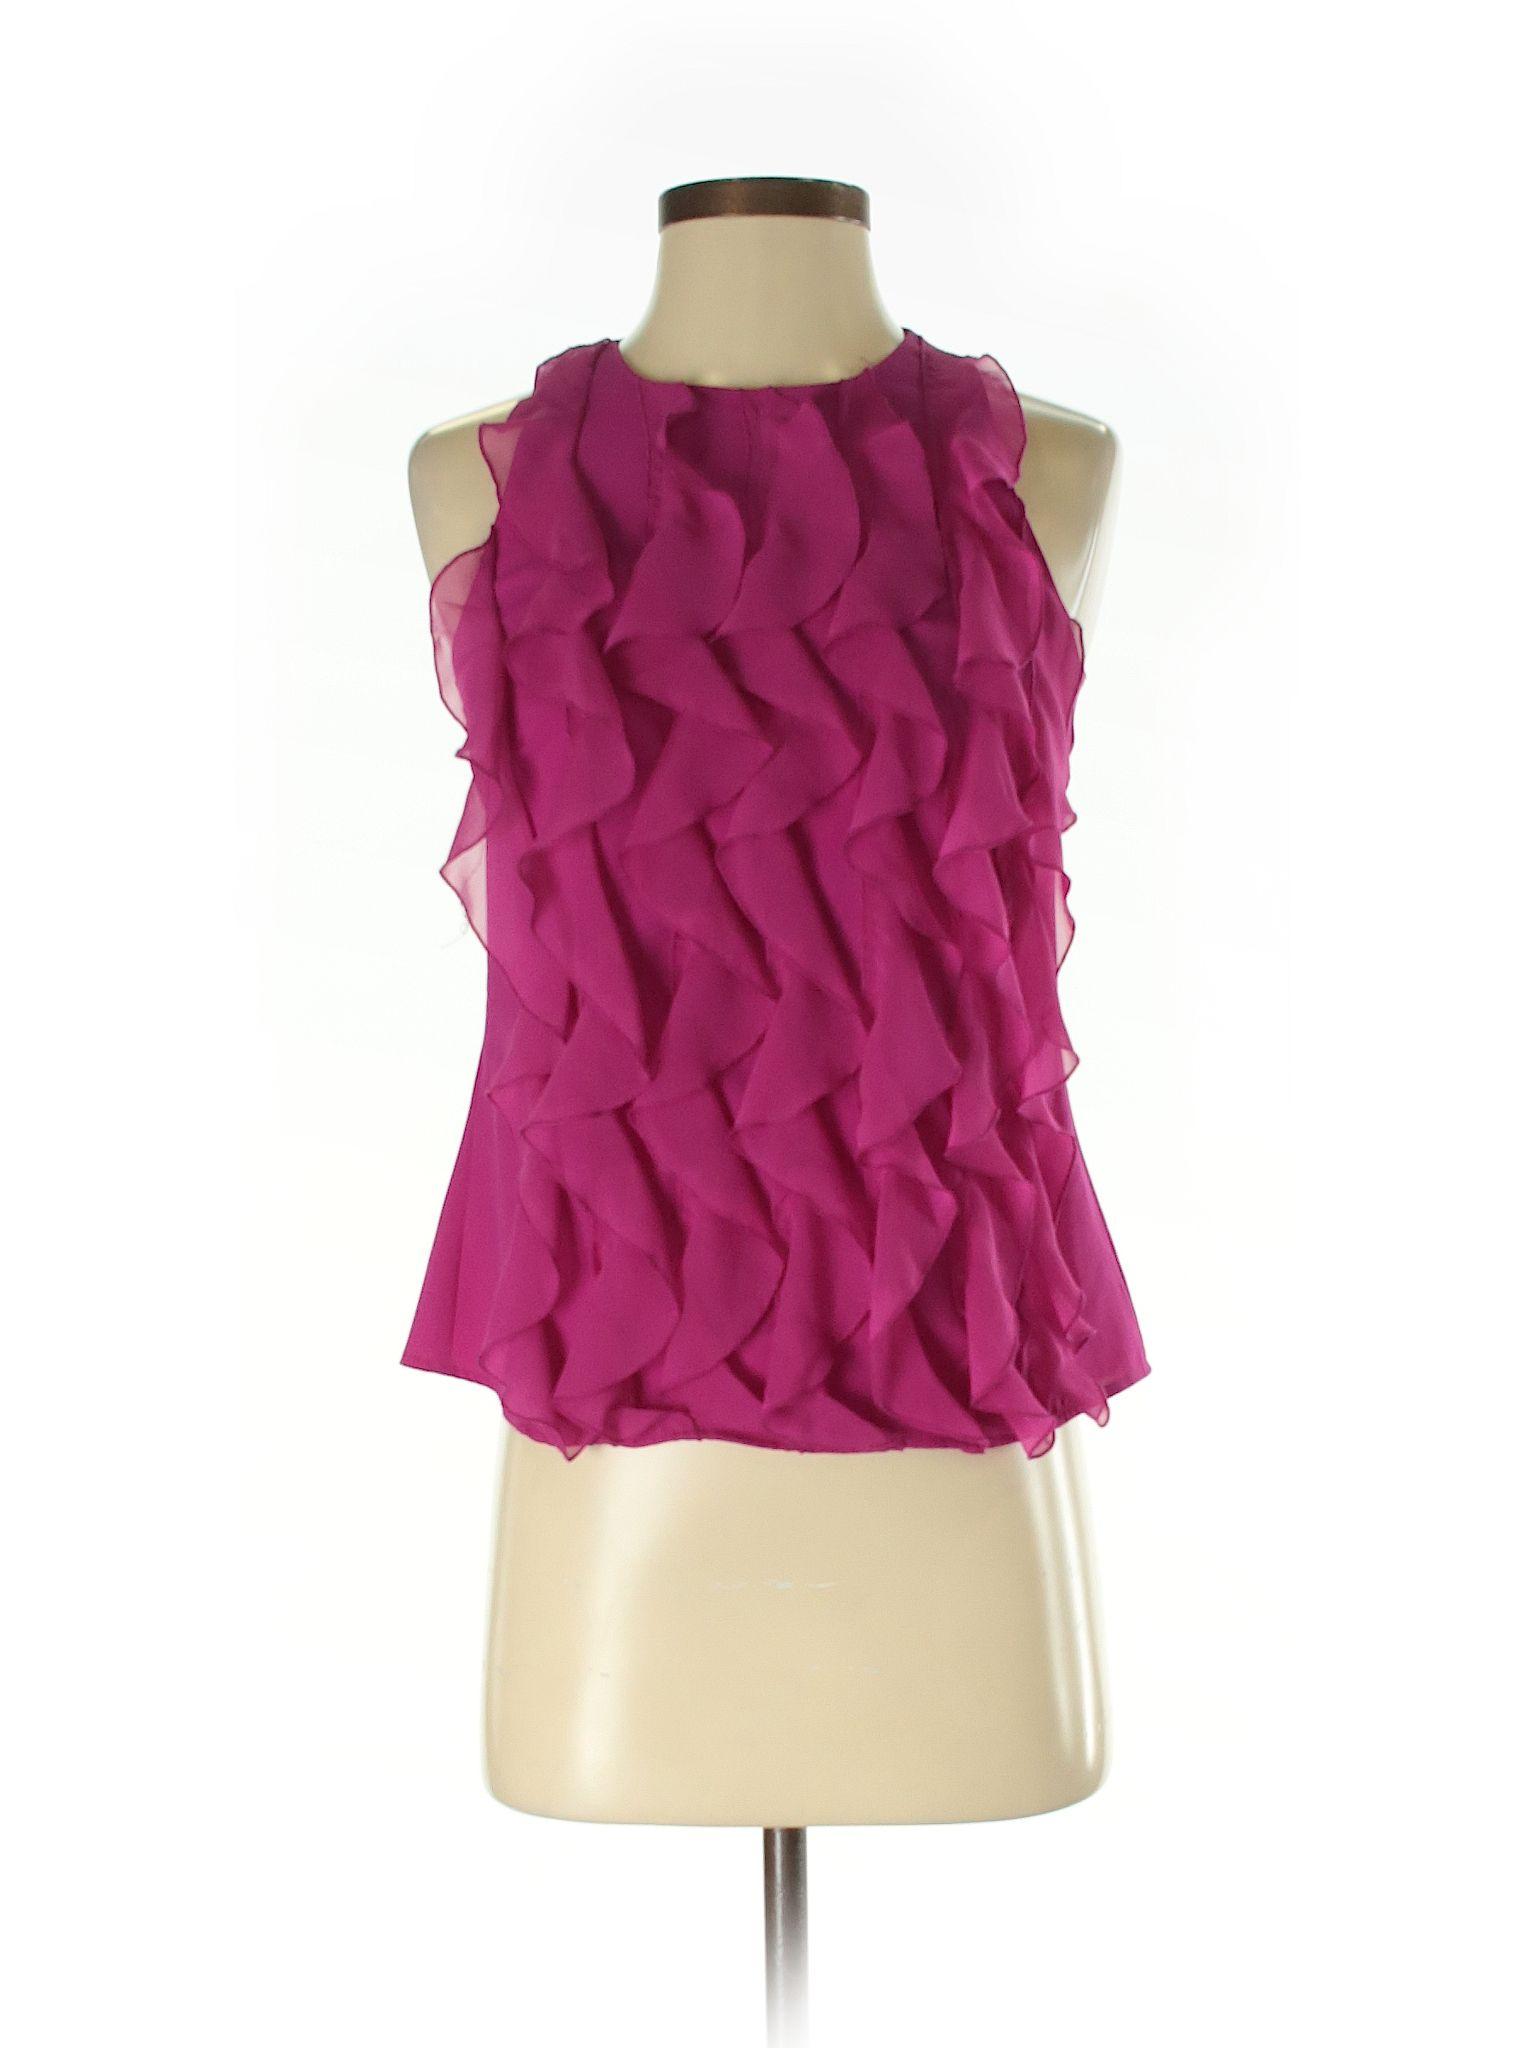 Trulli Sleeveless Blouse Size 000 Pink Womens Tops  $1199